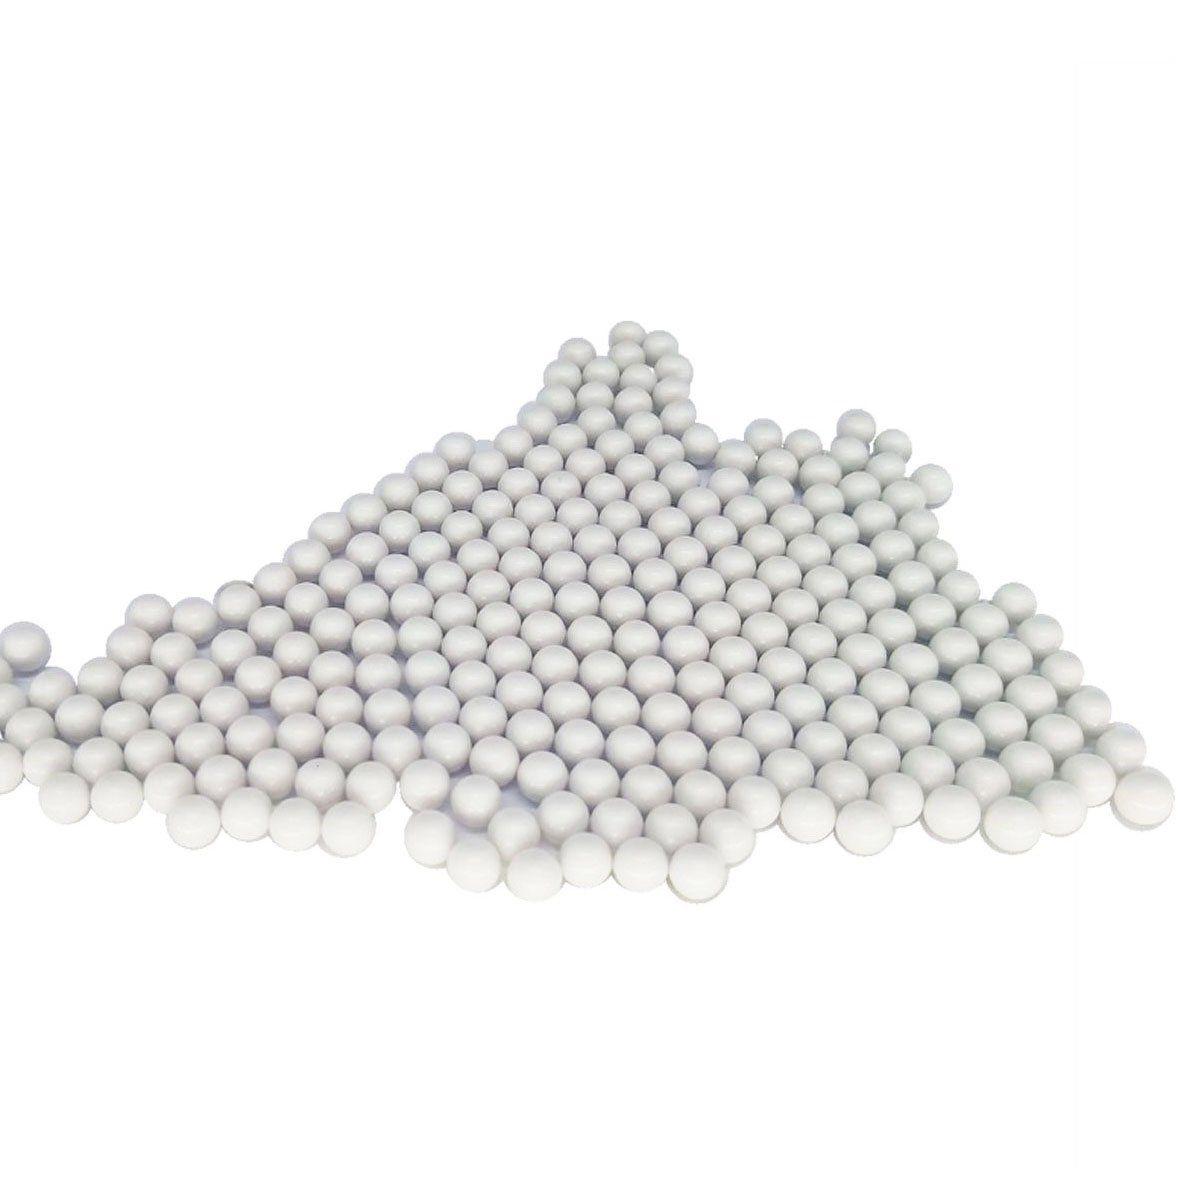 Esferas Plásticas BBs BB King Calibre 6mm 0,25g 3000un